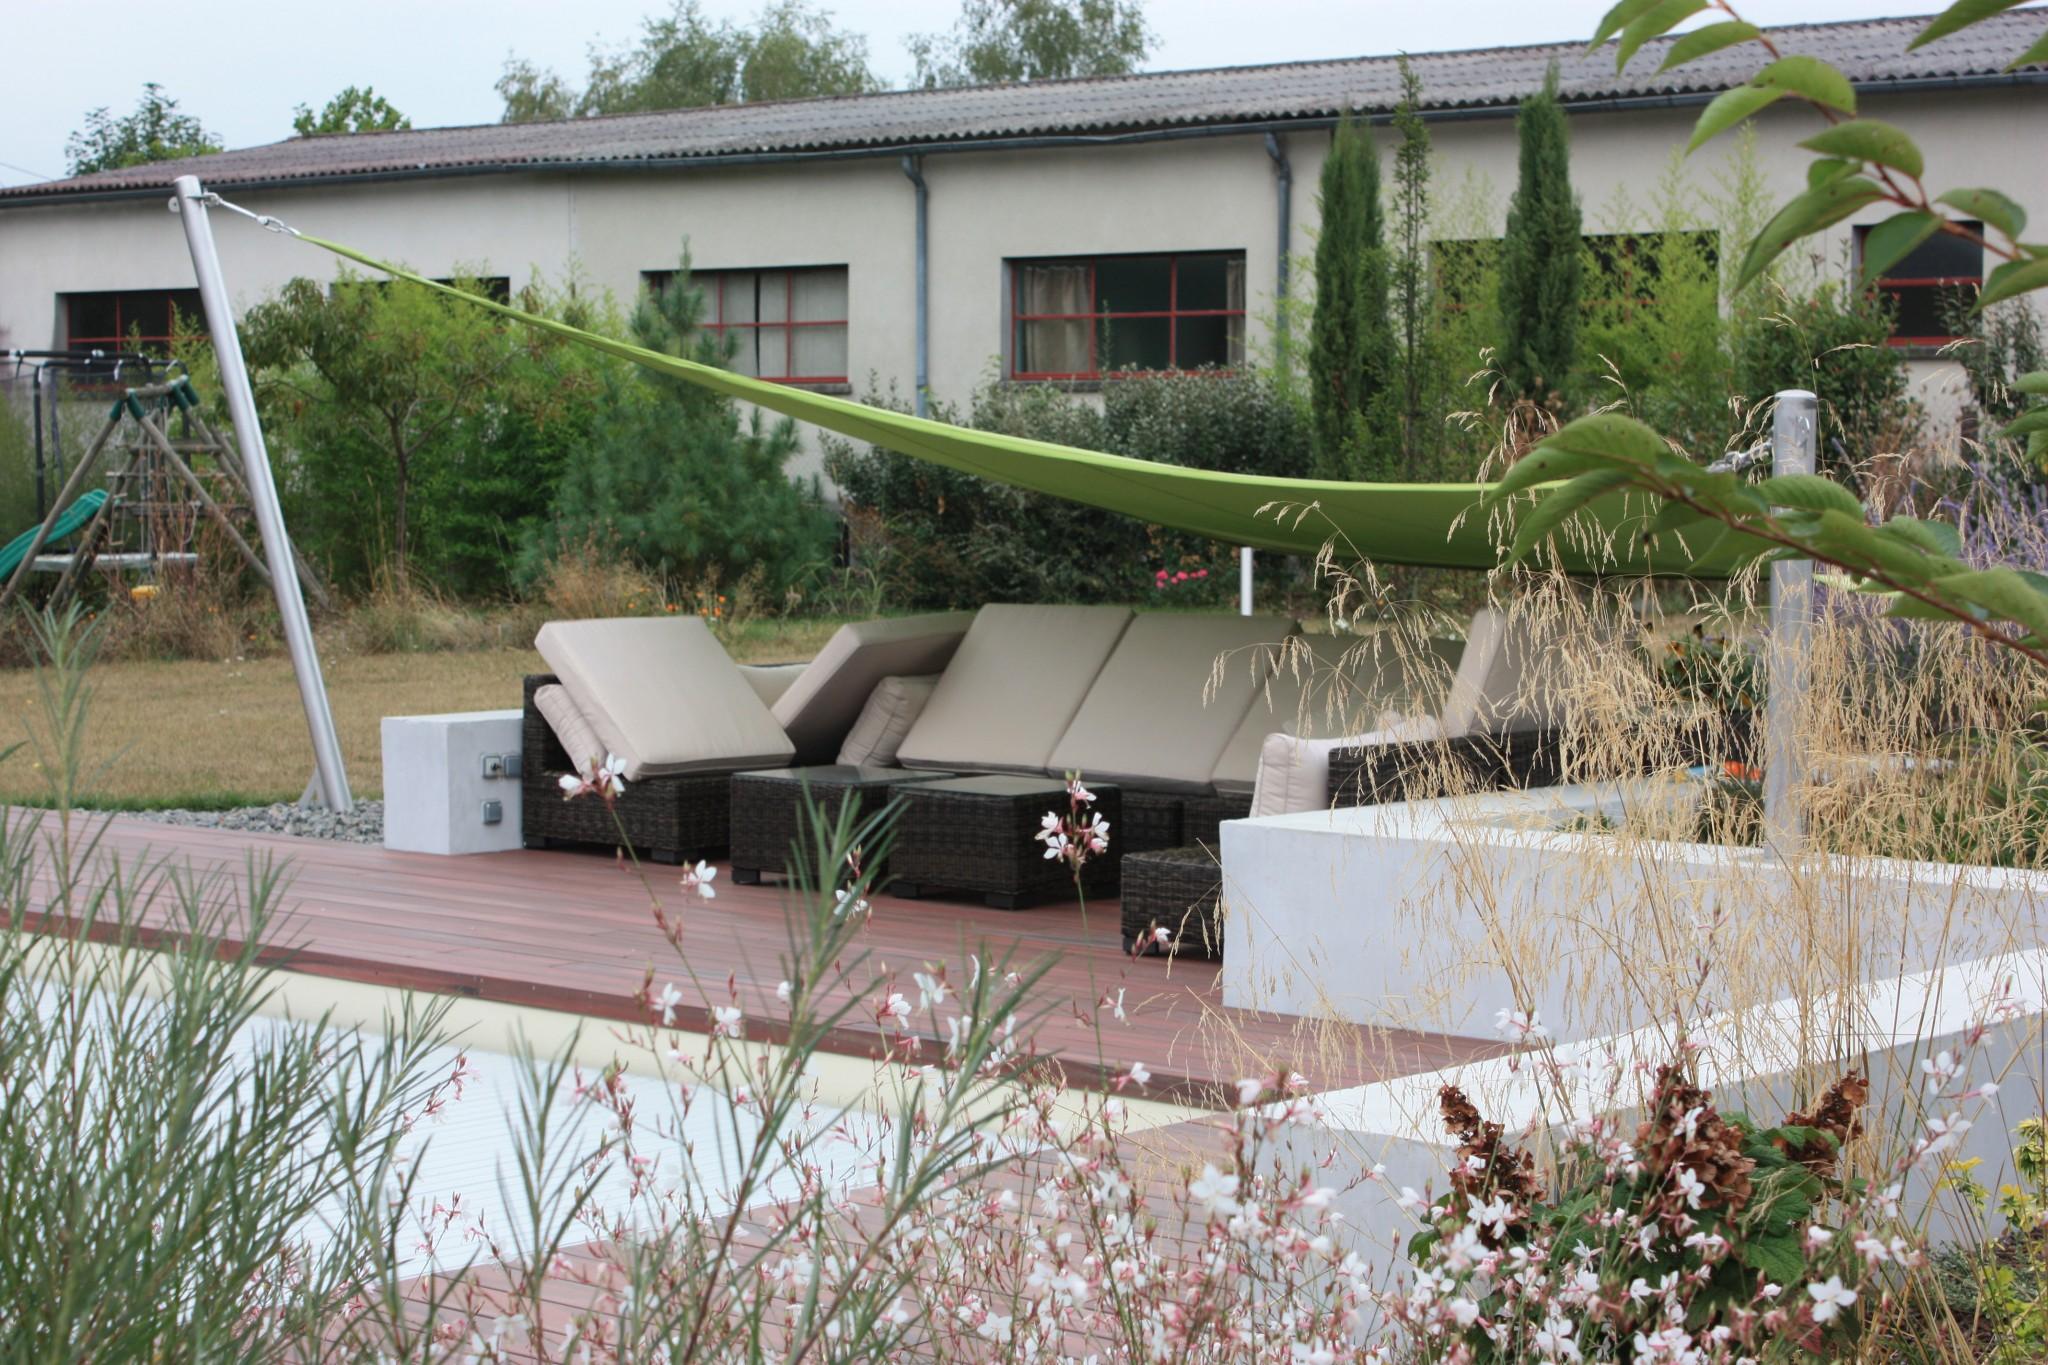 Toile ombrage verte sur terrasse